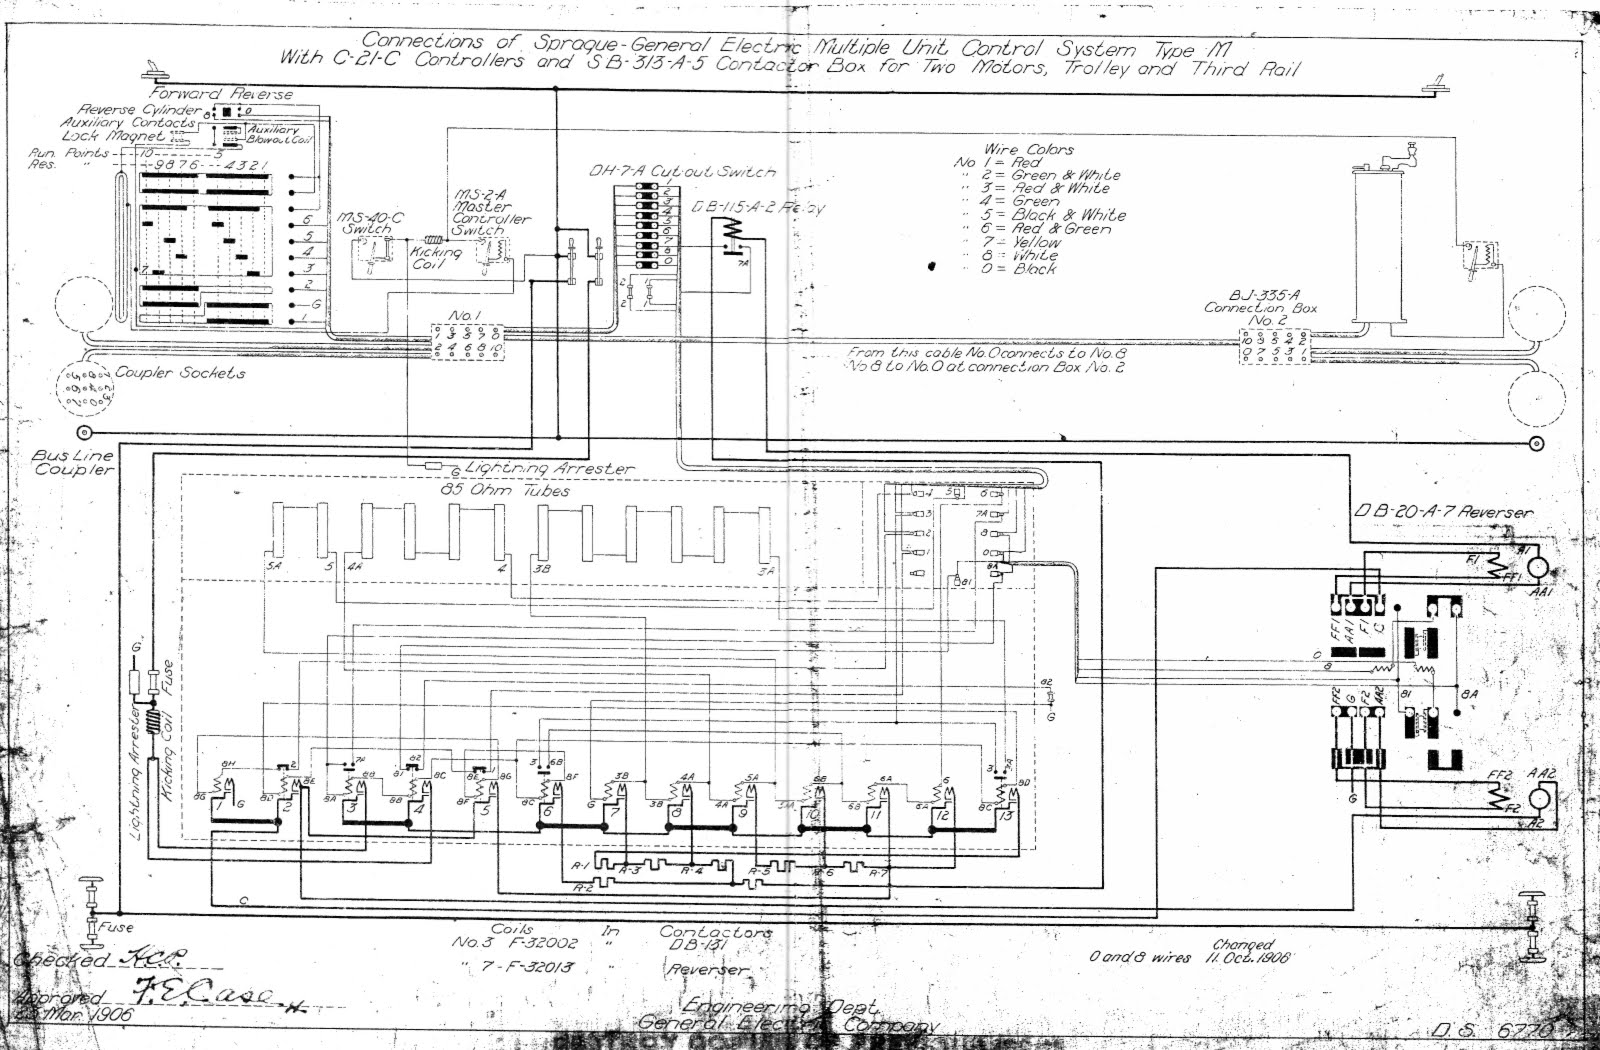 Murray Pm220as Fuse Box - Wiring Diagram Manual